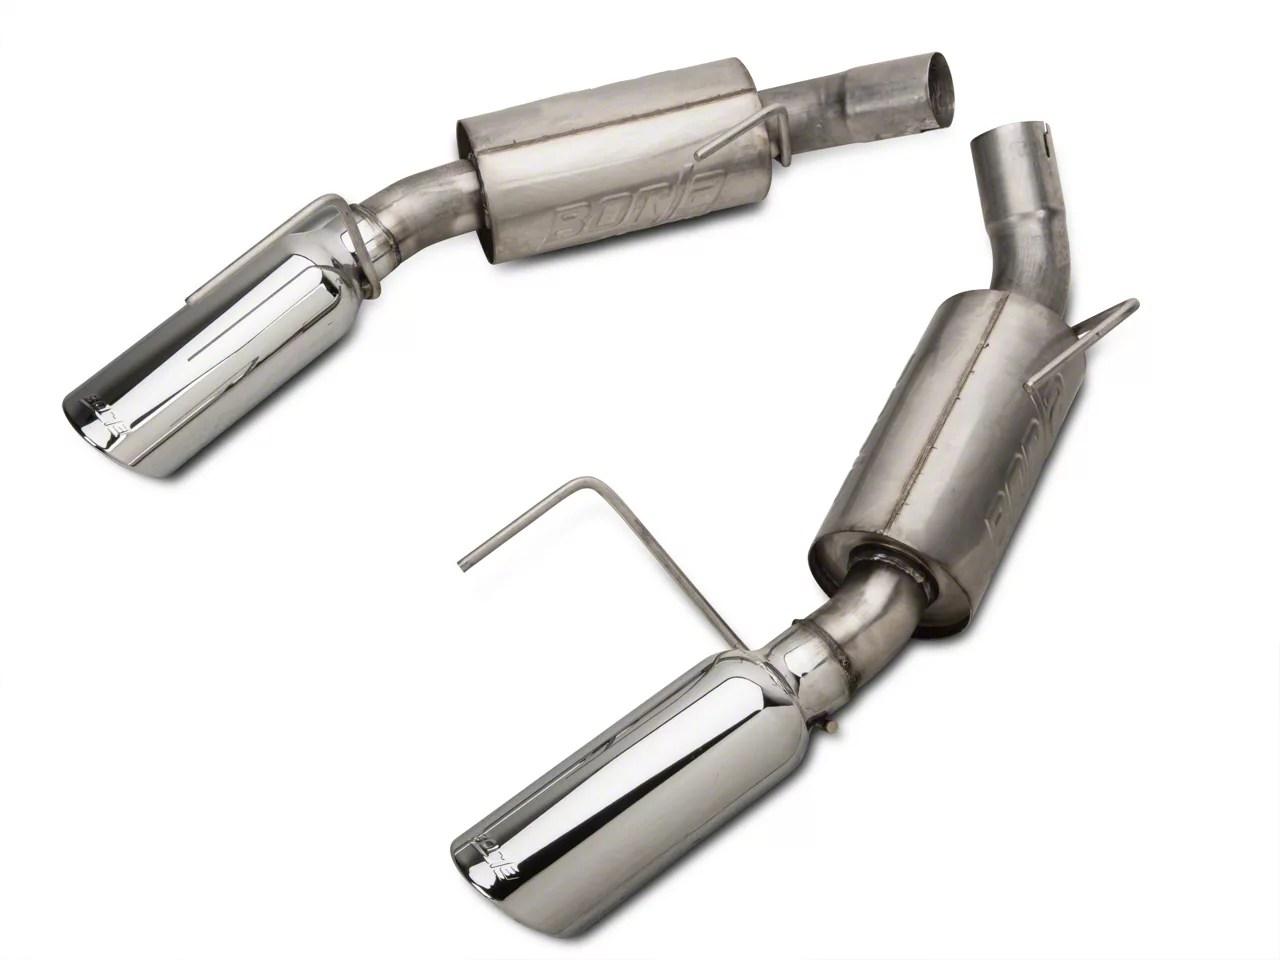 borla atak axle back exhaust with polished tips 05 09 gt